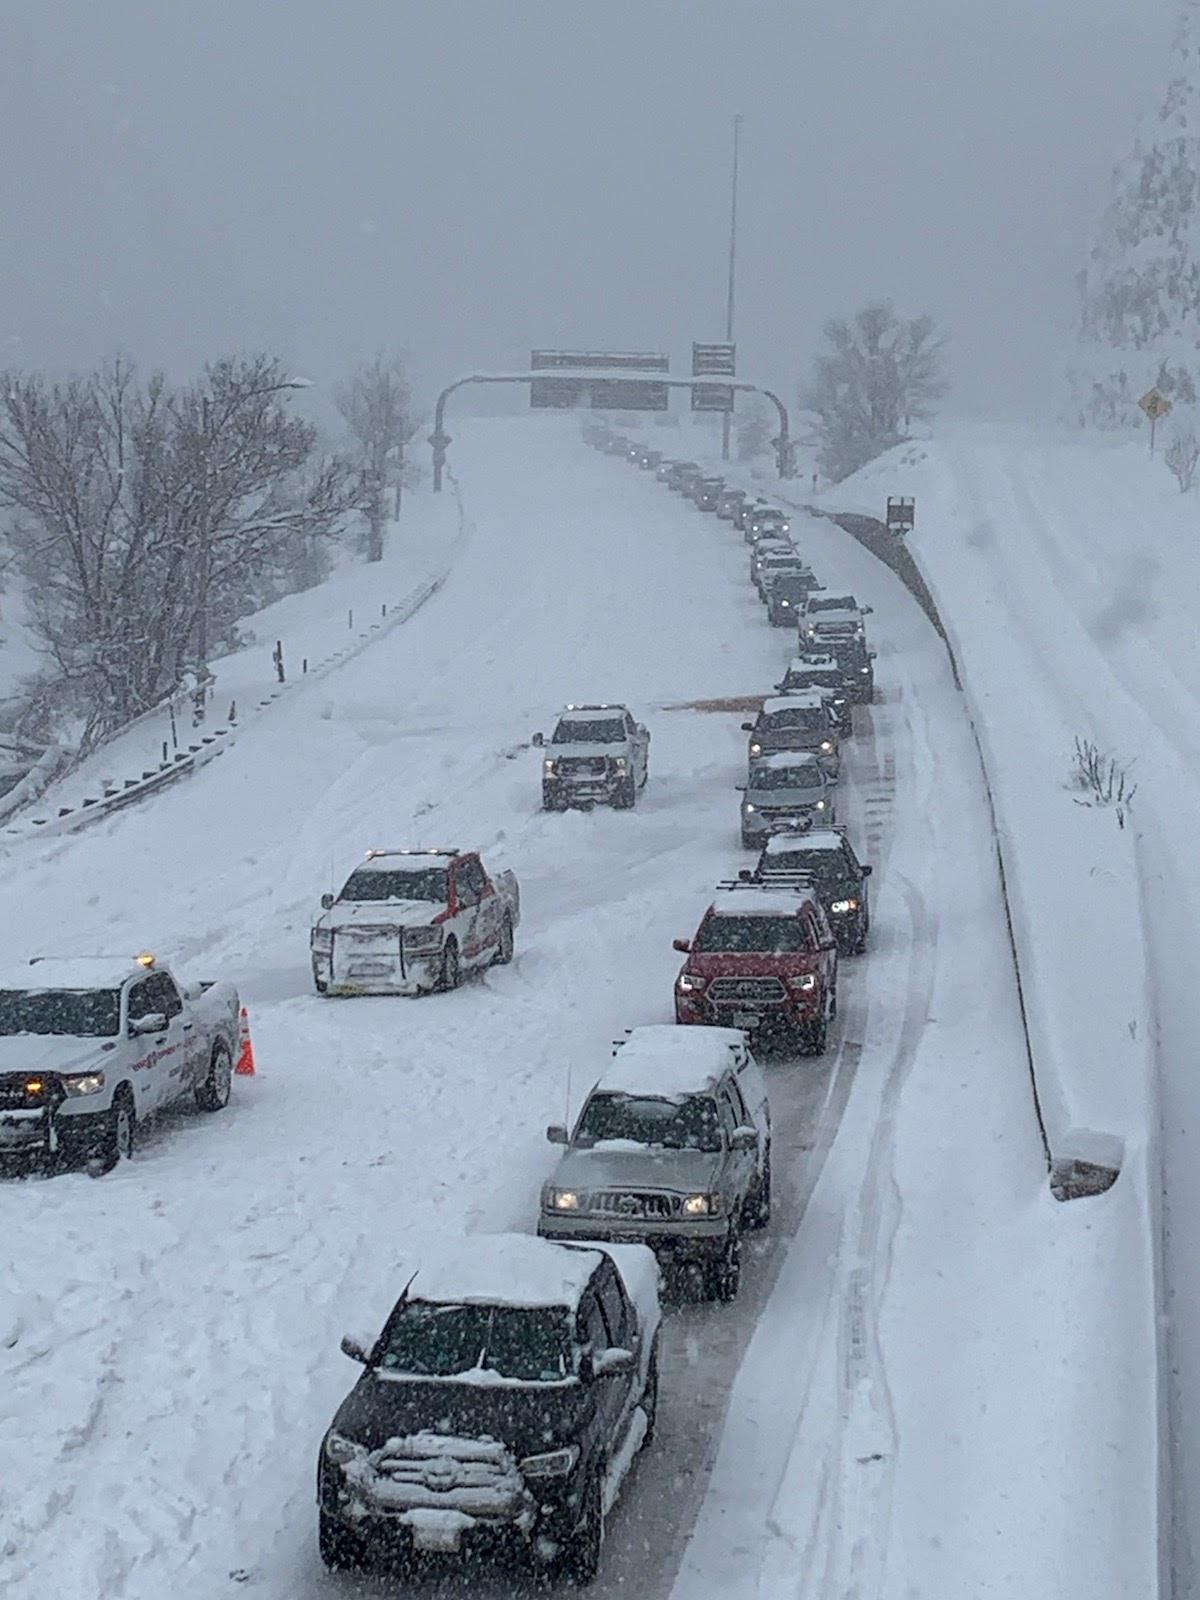 Traffic I-70 Floyd Hill 1 Mar 14.jpg detail image